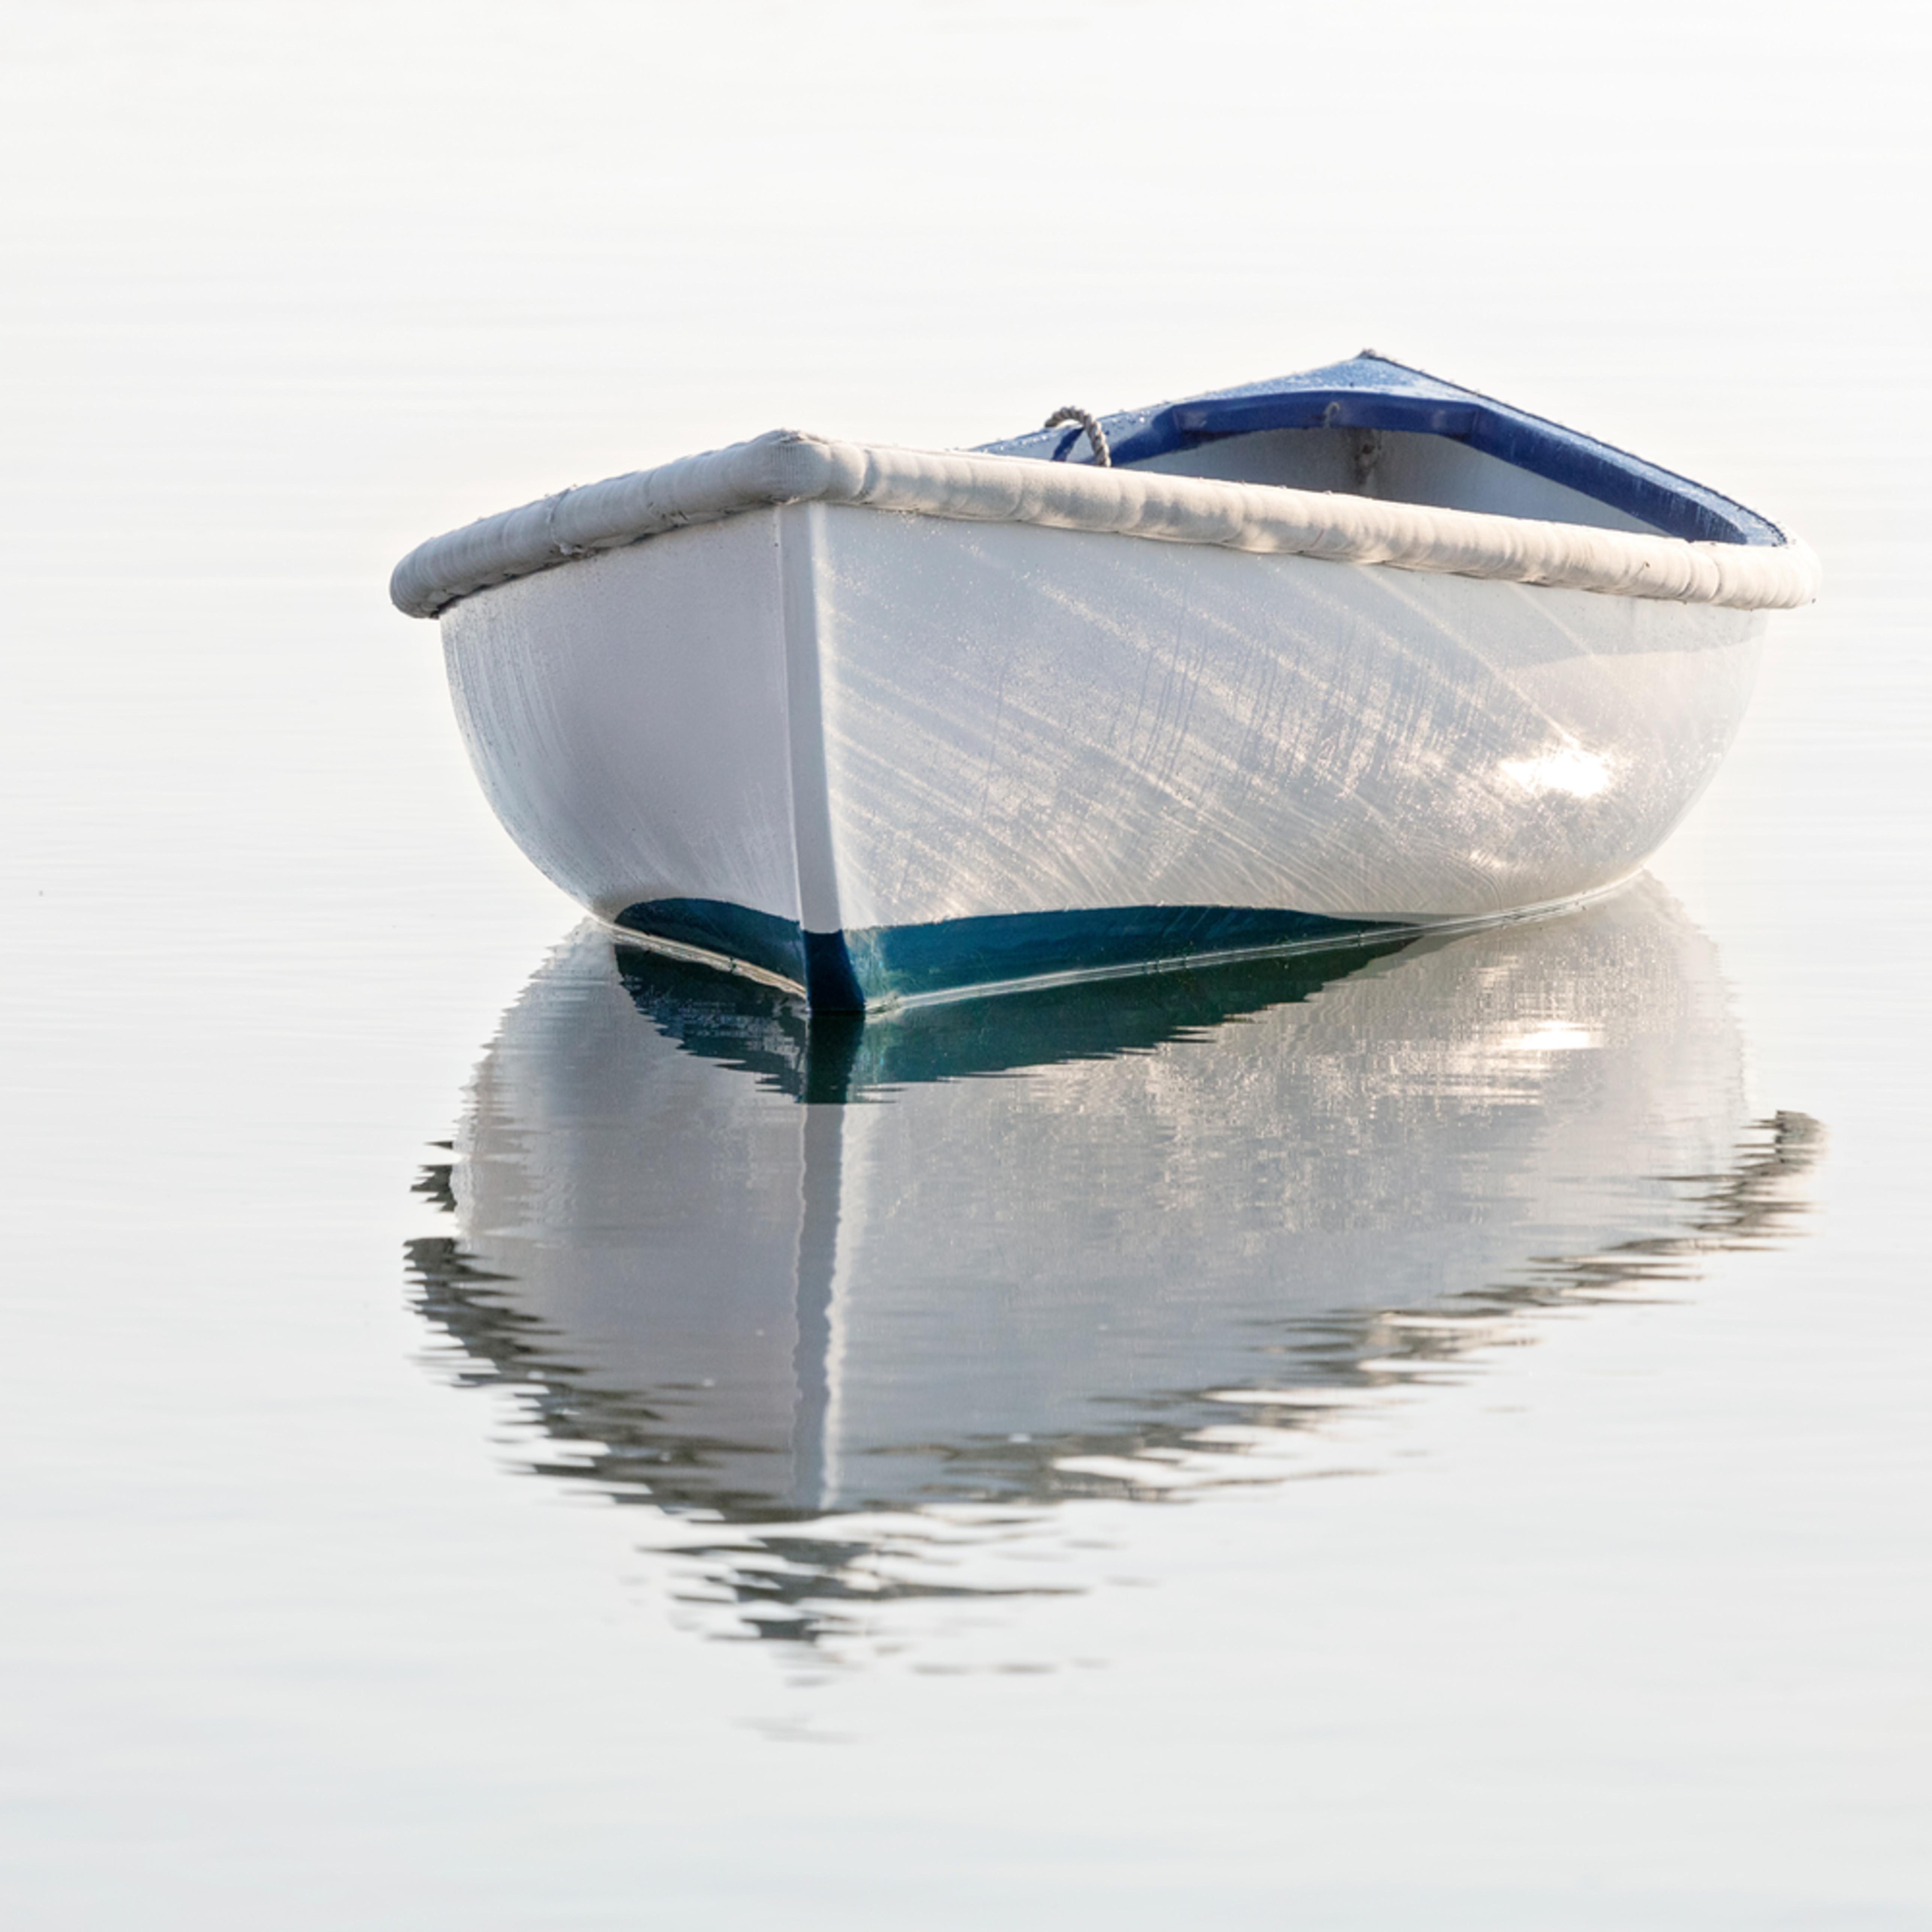 Vineyard haven harbor white dory czcosm